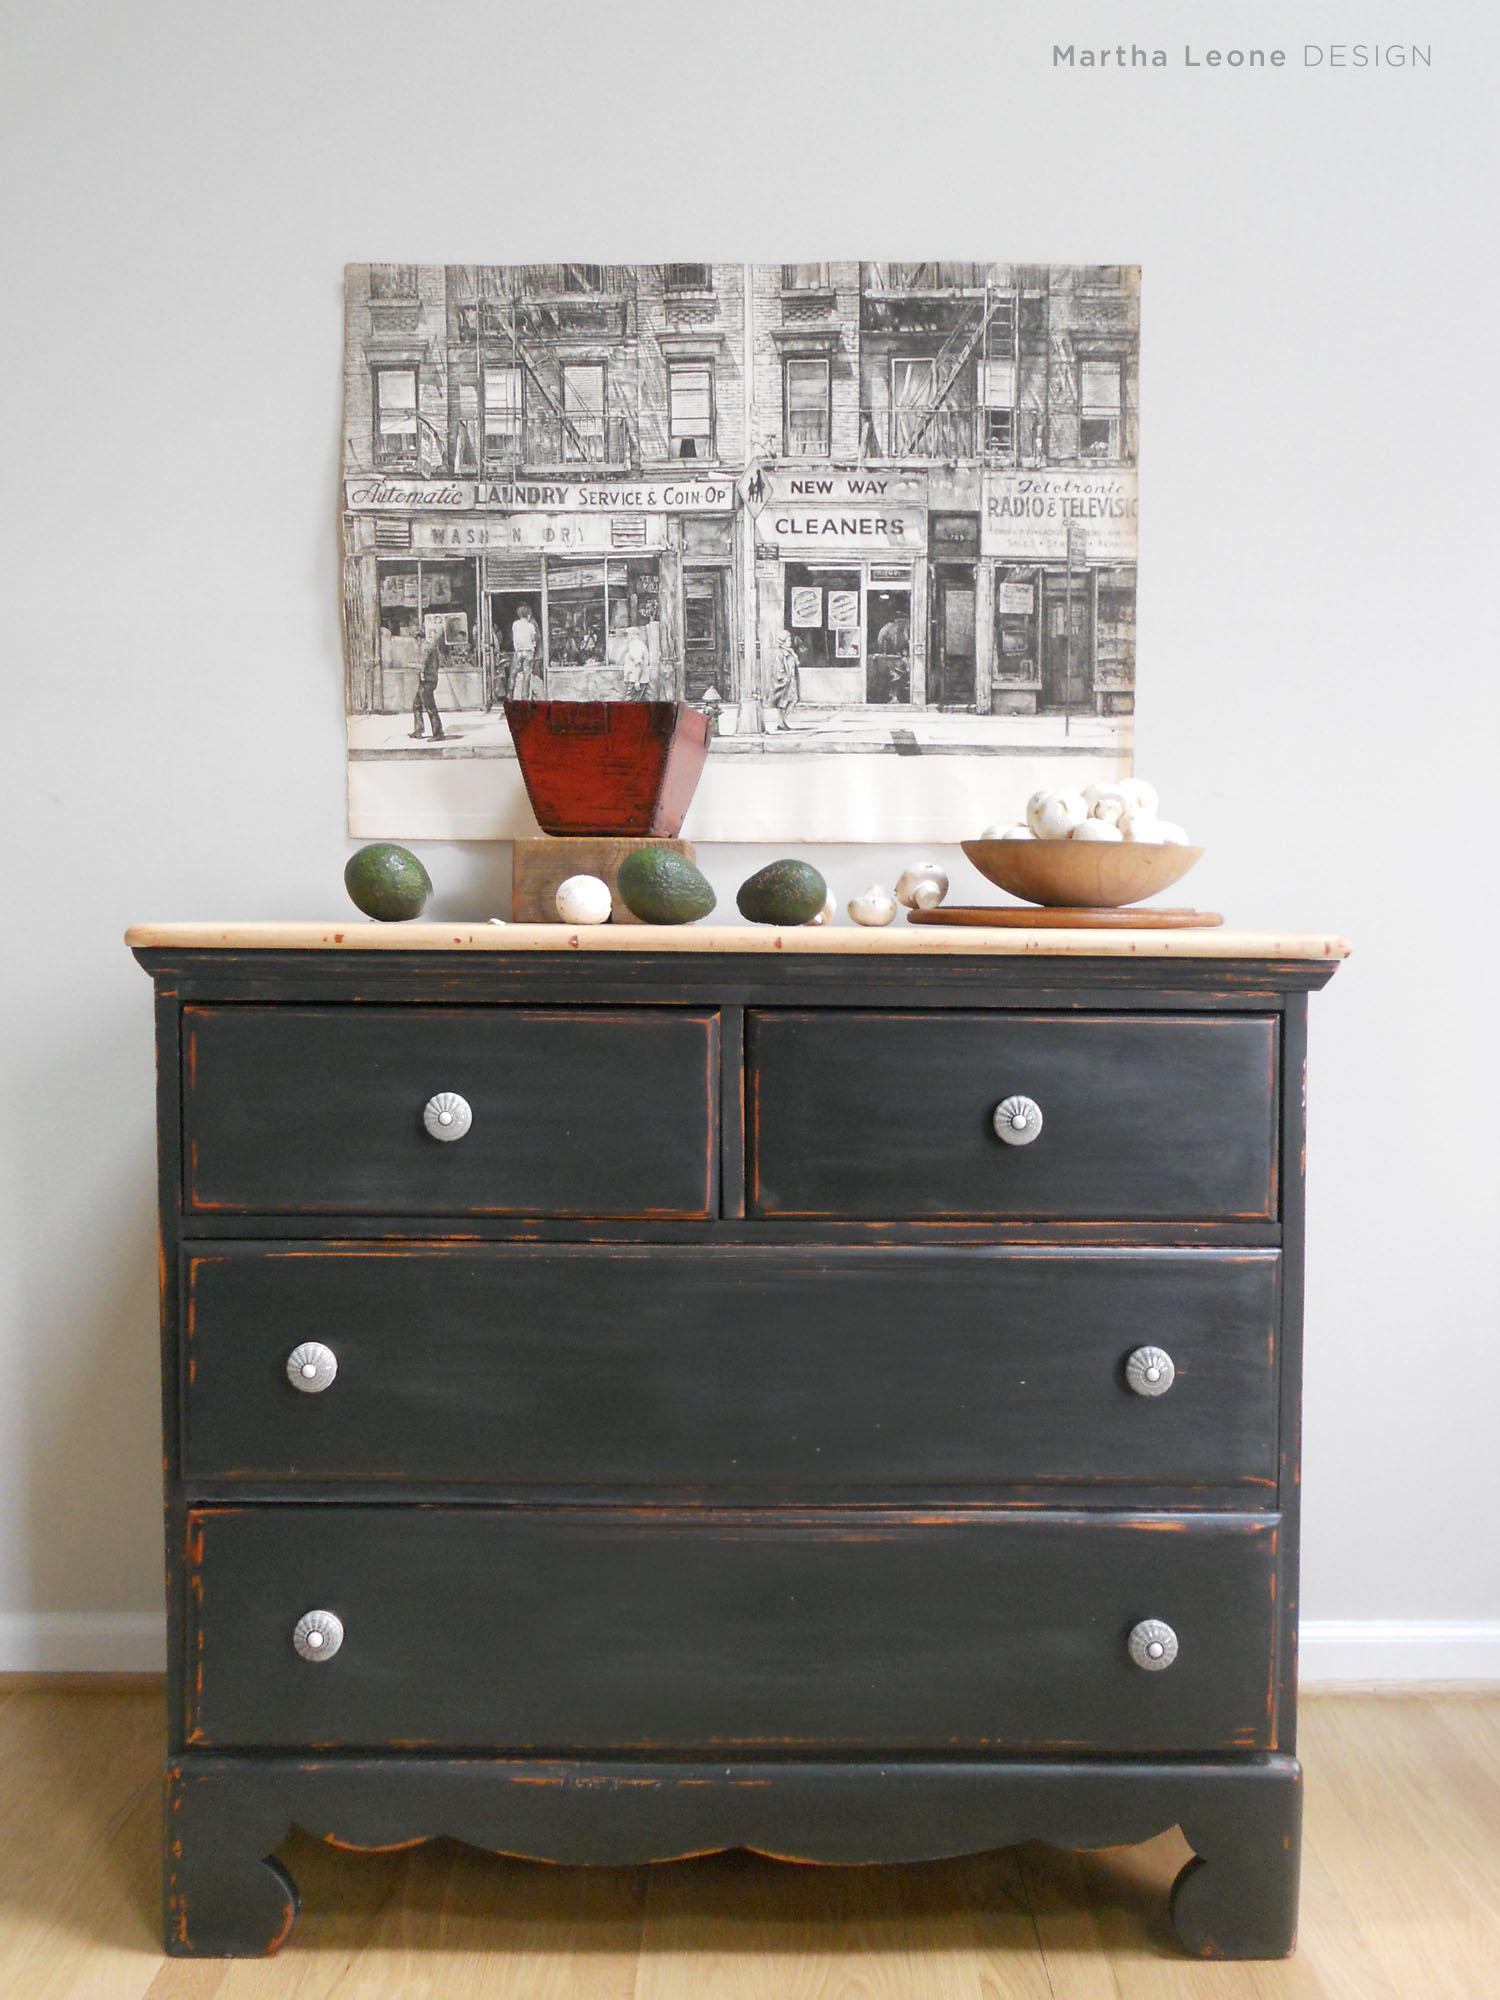 black-chest-of-drawers8-martha-leone-design.jpg